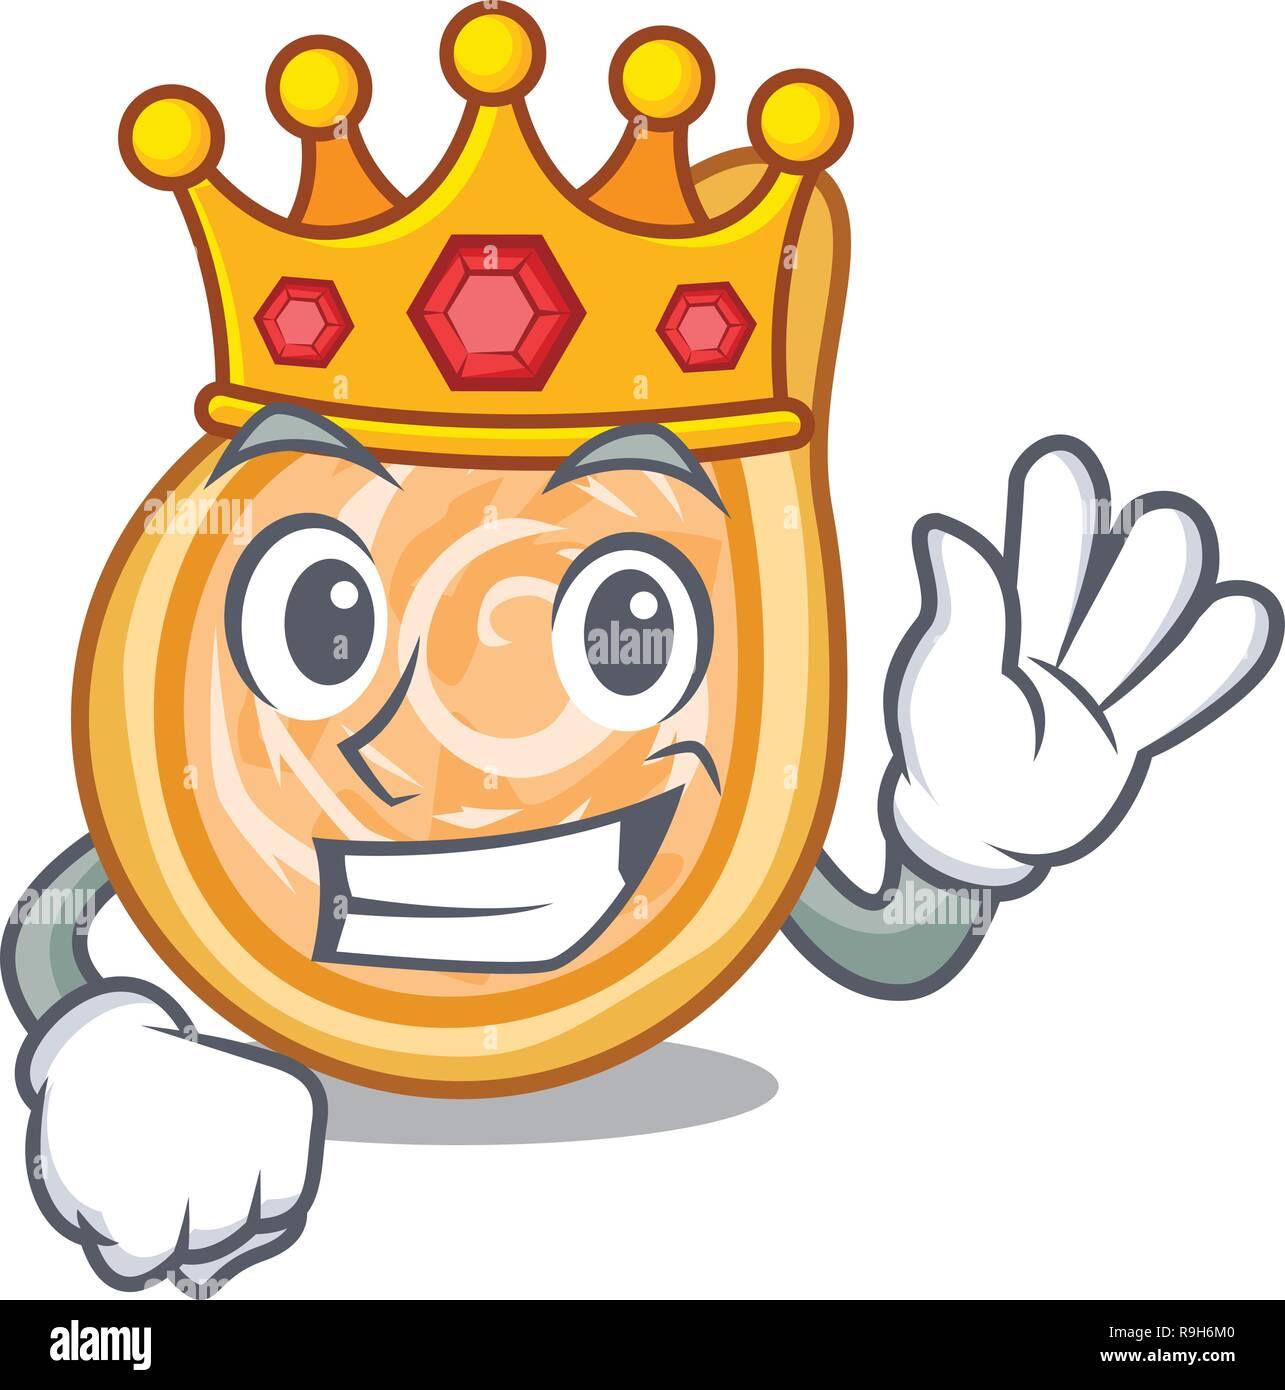 King chicken coxinha in shape a cartoon - Stock Vector